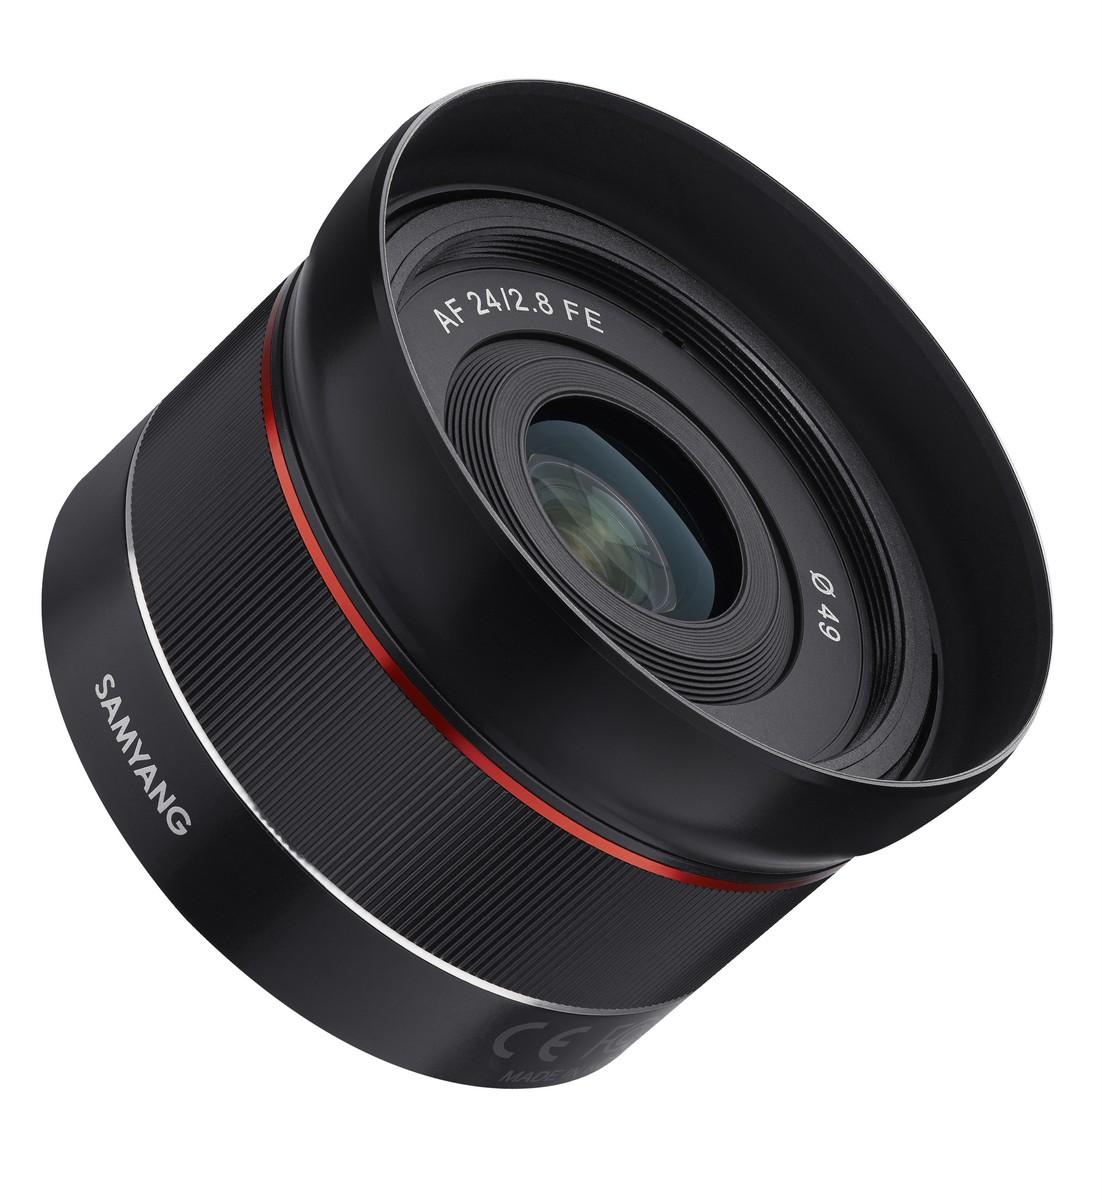 Item The company samyang 24mm F2.8 AF Sony E-mount RIMEX MONEY